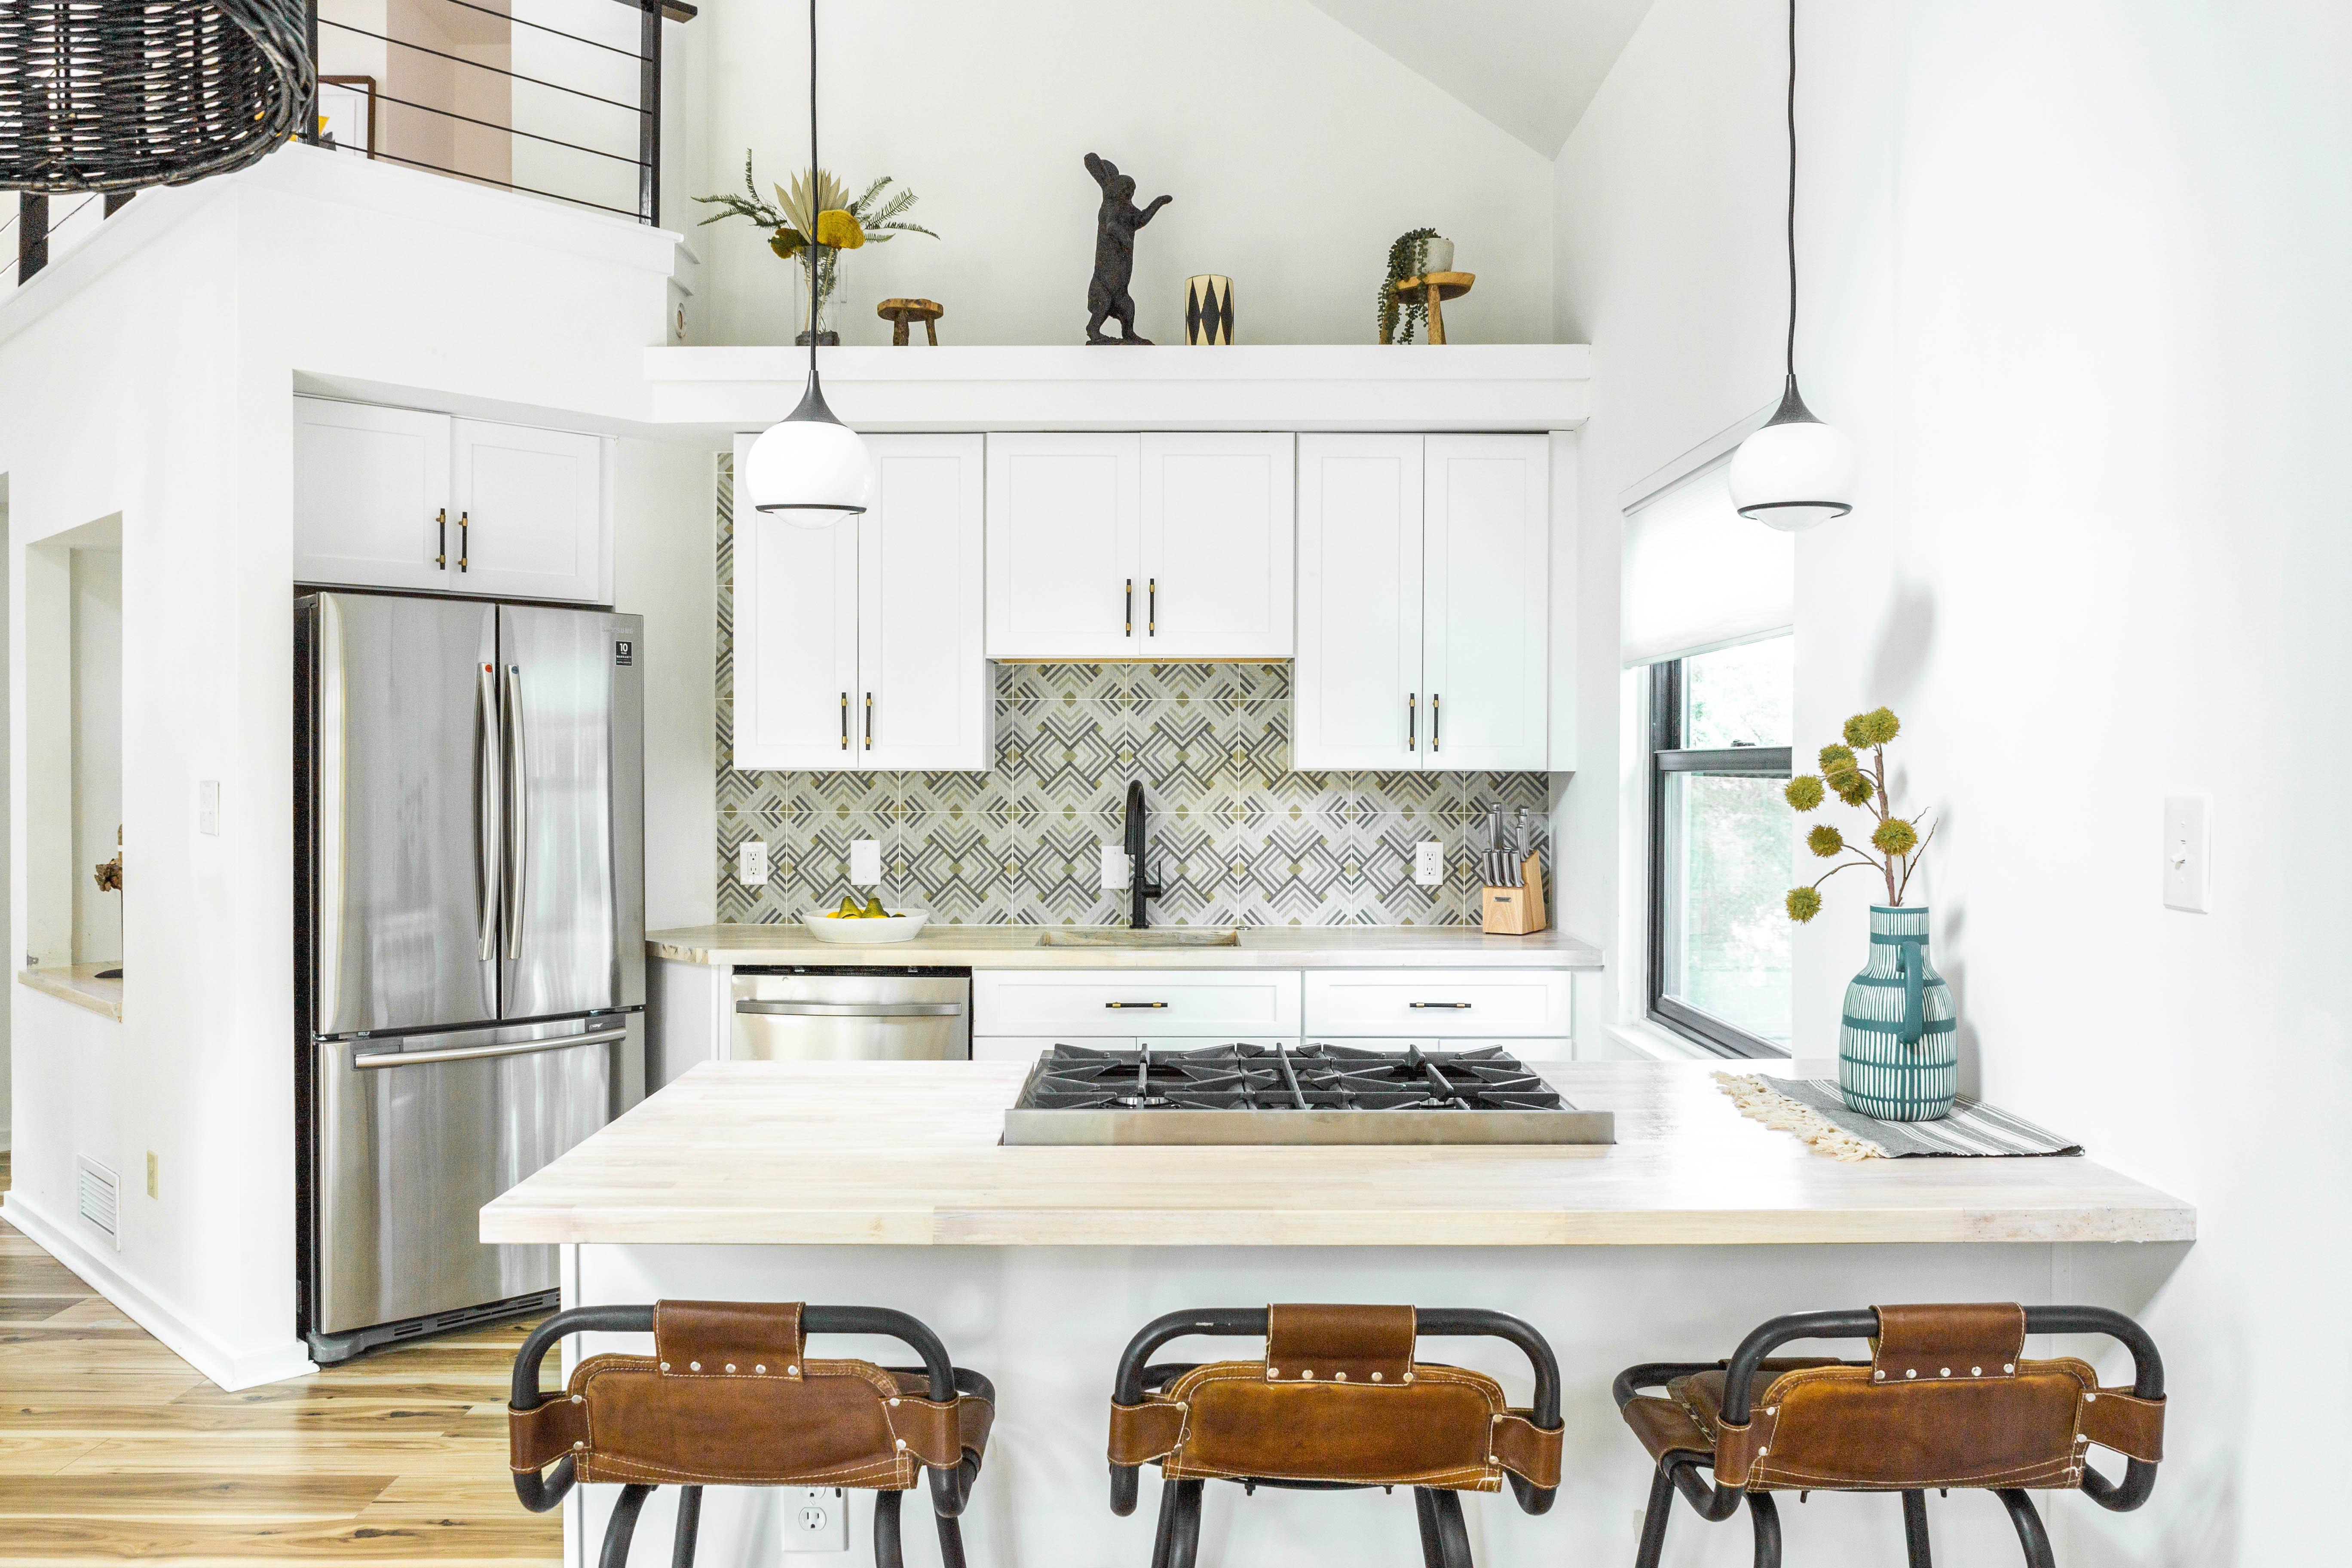 04 kitchen 20210627-IMG_7458.jpg